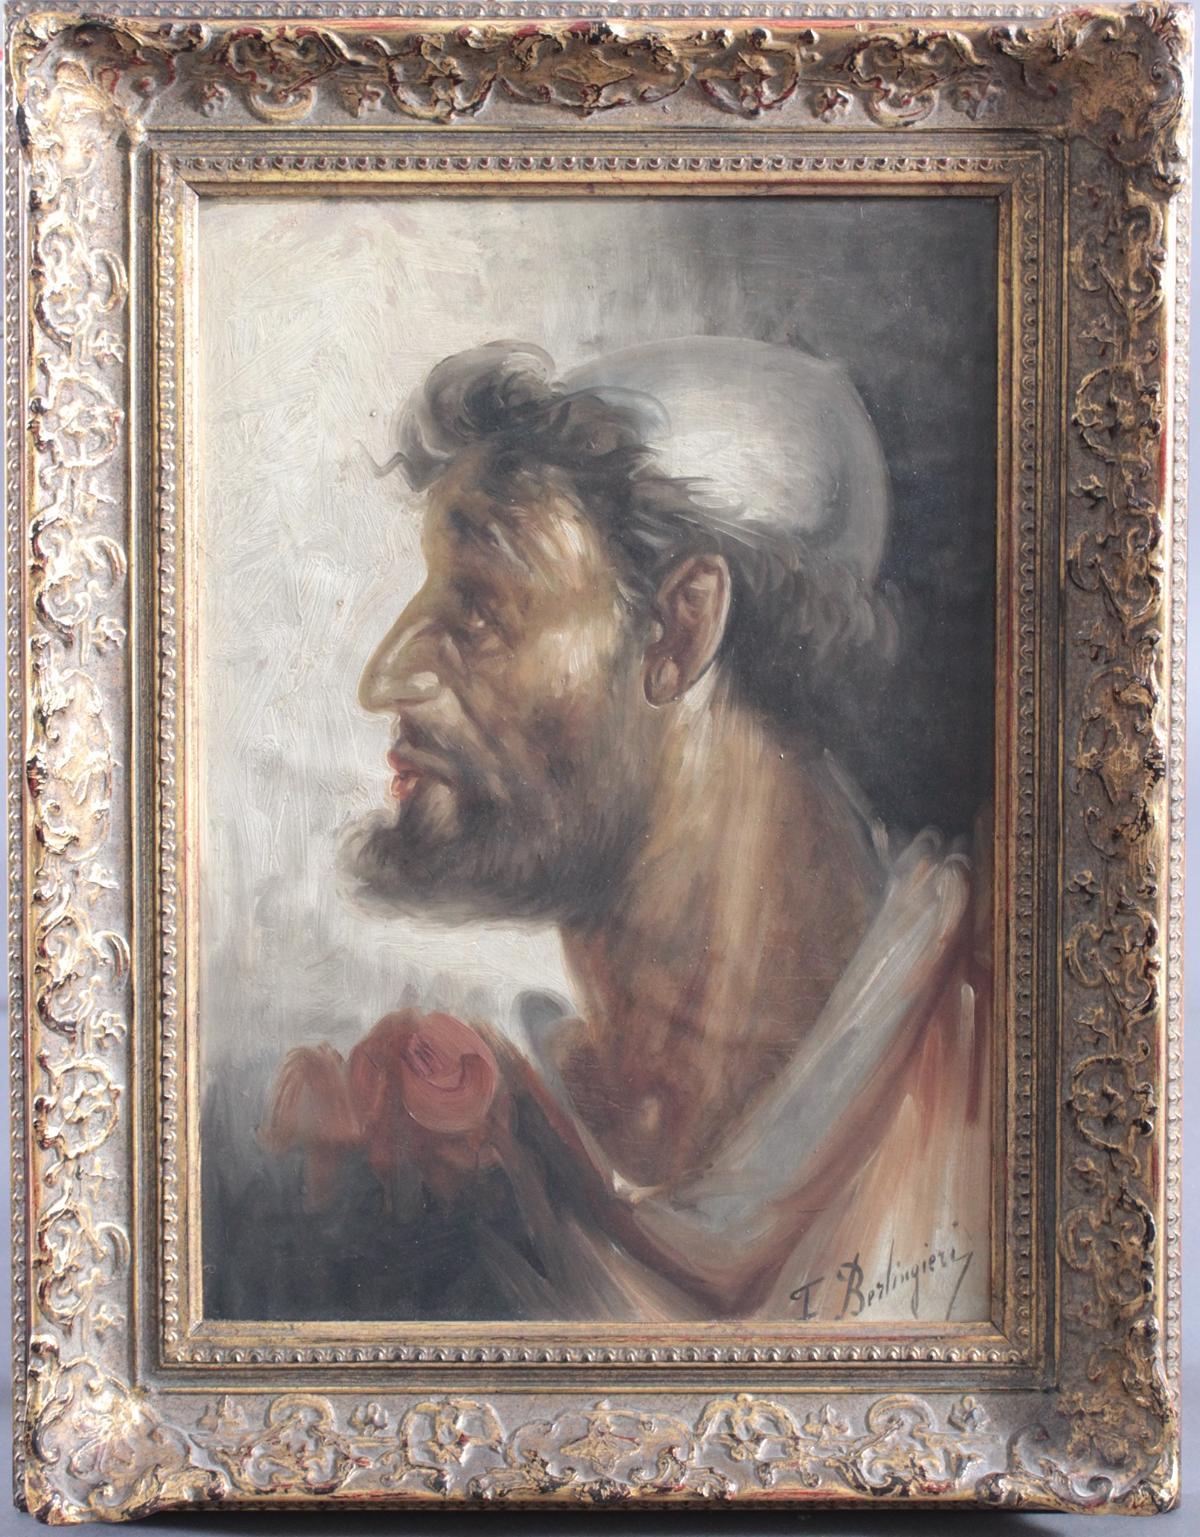 F. Berlingieri ? – ?, Herrenporträt im Profil